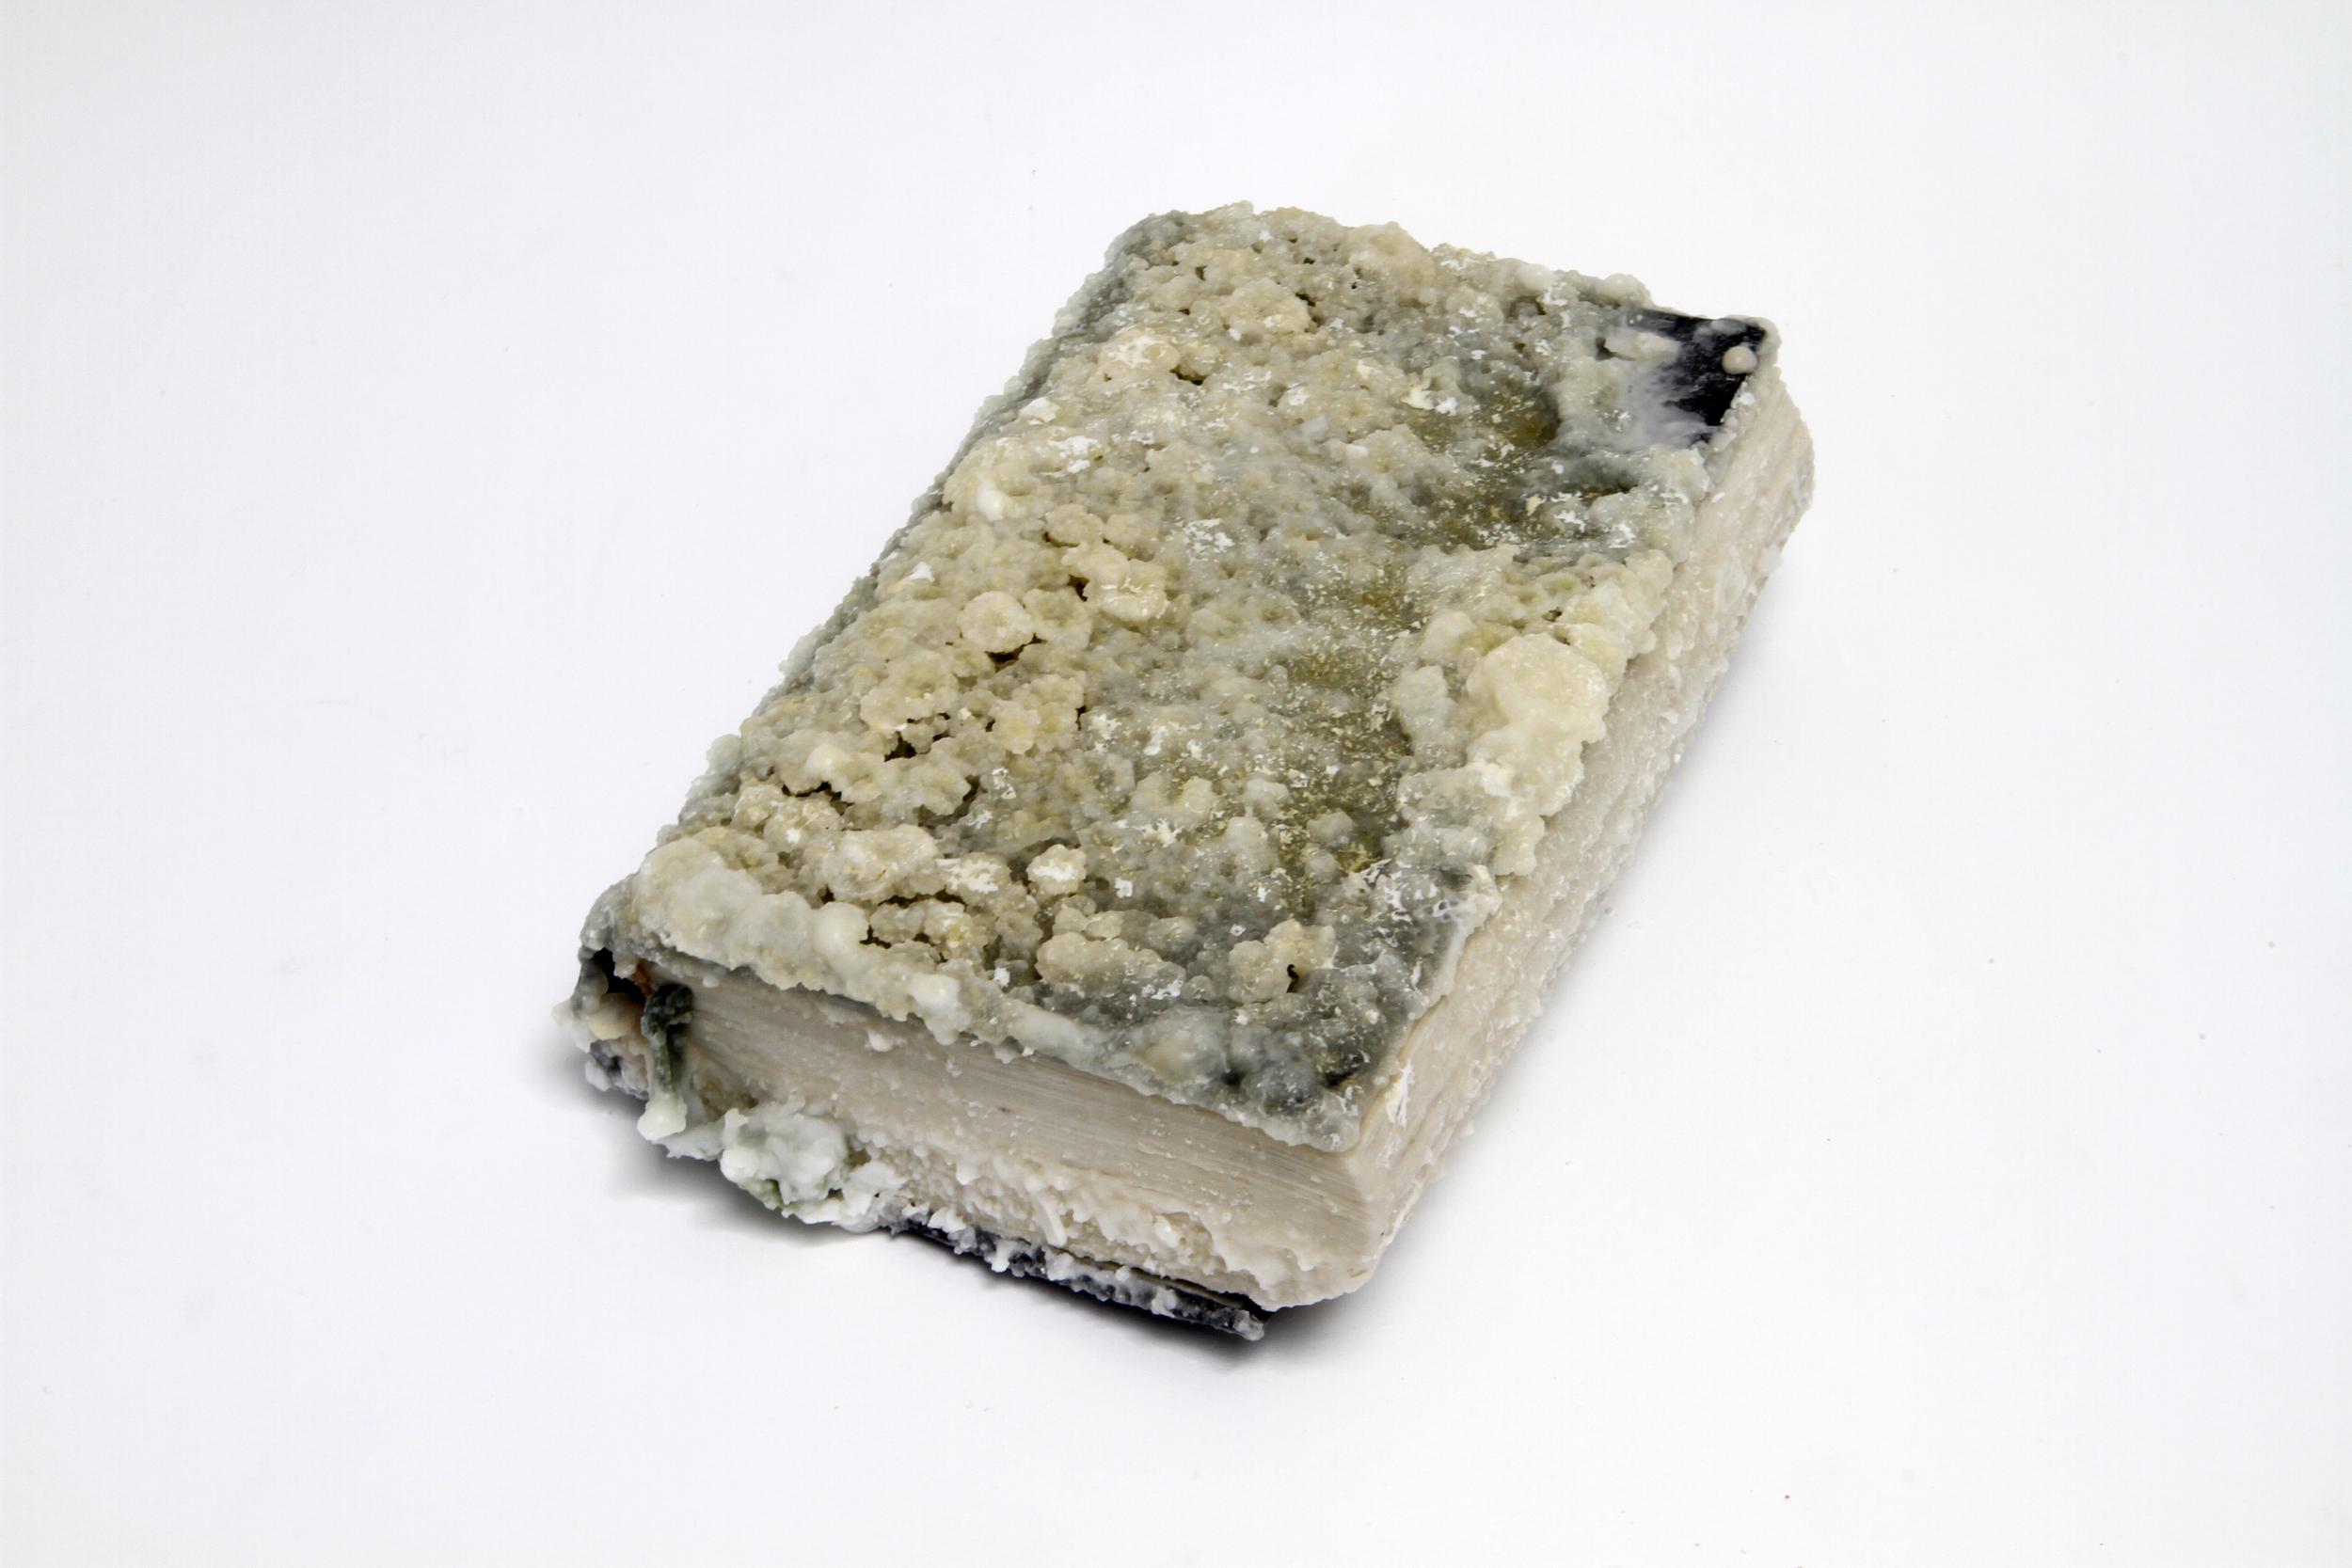 Relic (Physiology of Taste, Jean Anthelme Brillat-Savarin)  2012 Found book, monosodium glutamate (MSG), epoxy 5.5 x 2 x 8.5 inches